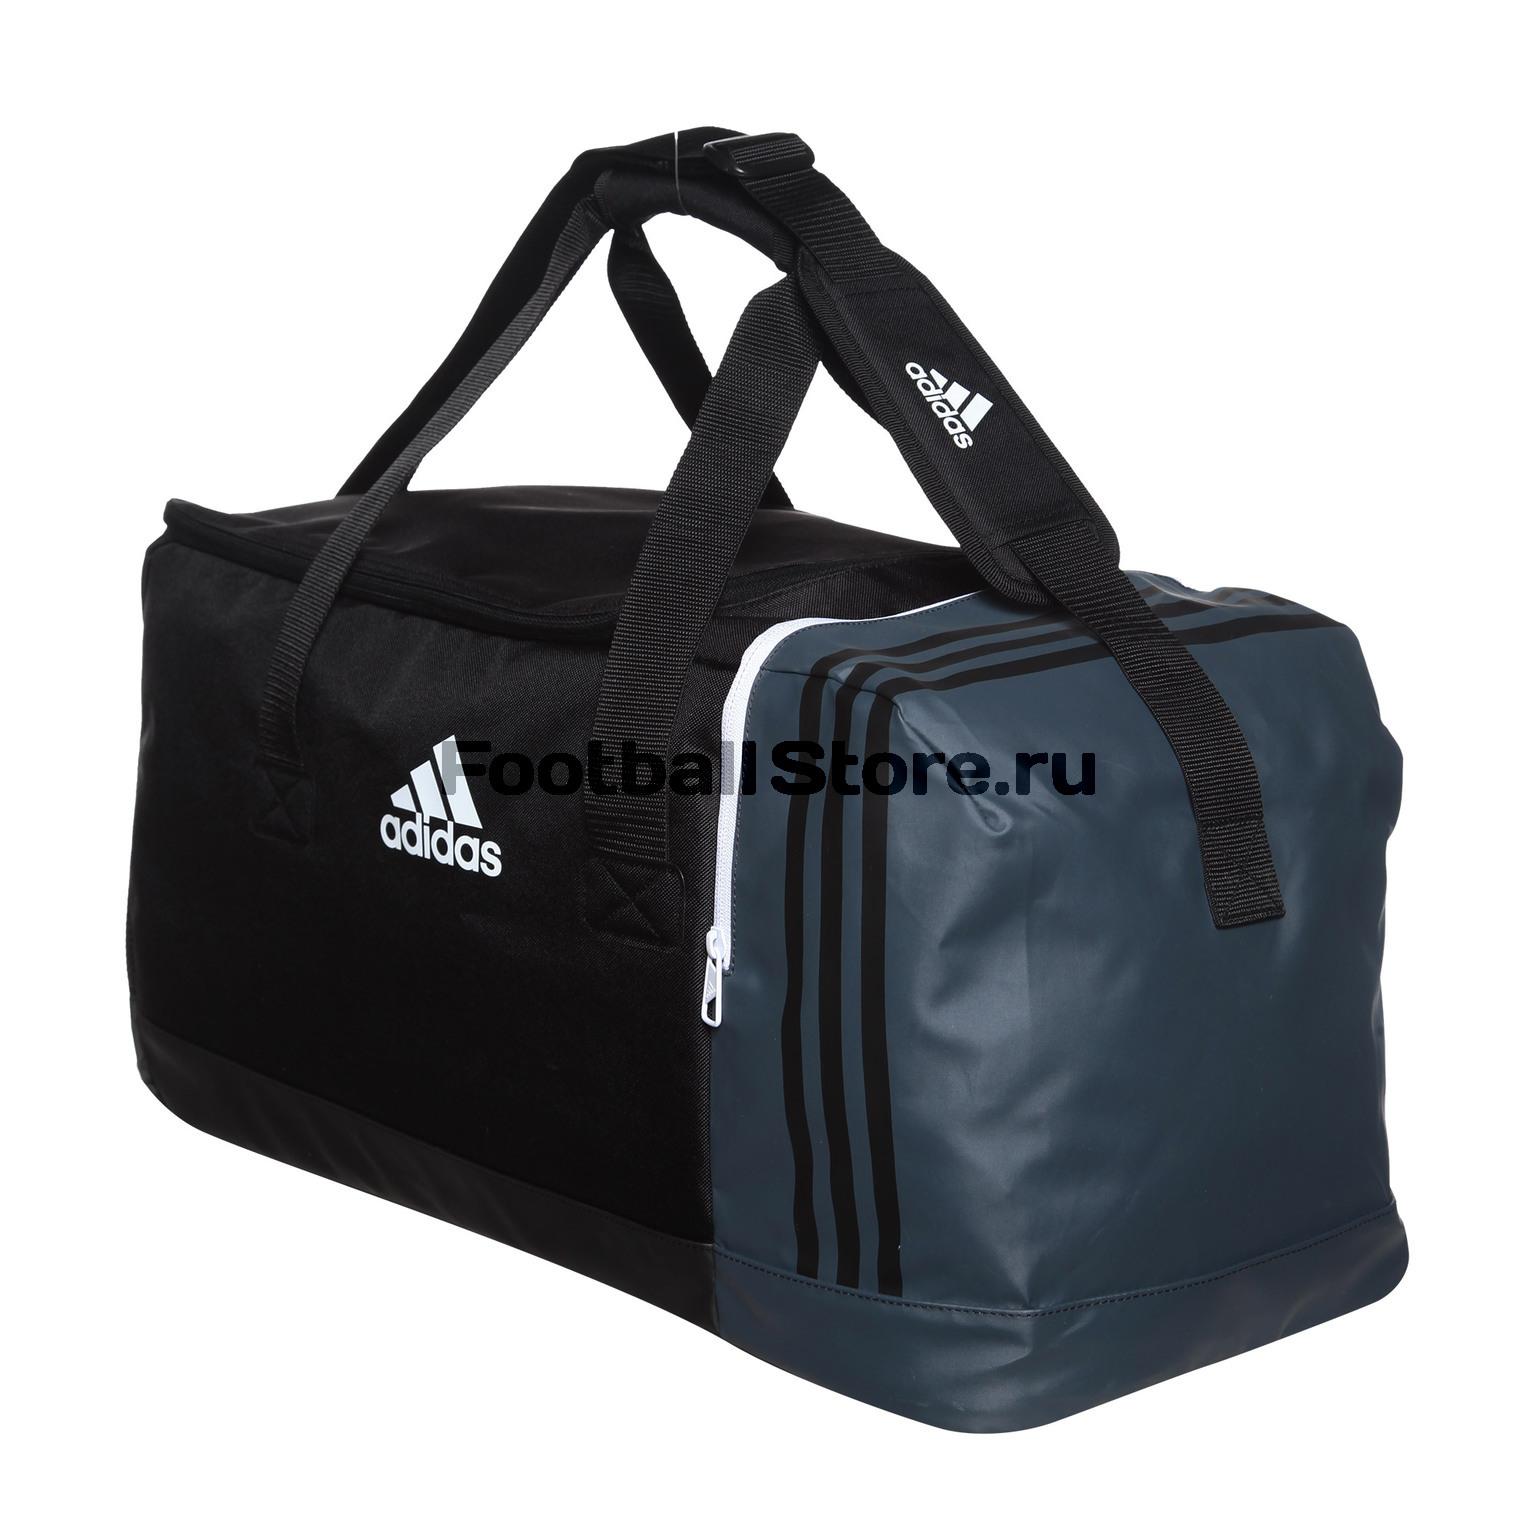 Фото - Сумка Adidas Tiro TB M S98392 шапка мужская adidas tiro beanie цвет черный bq1662 размер 58 60